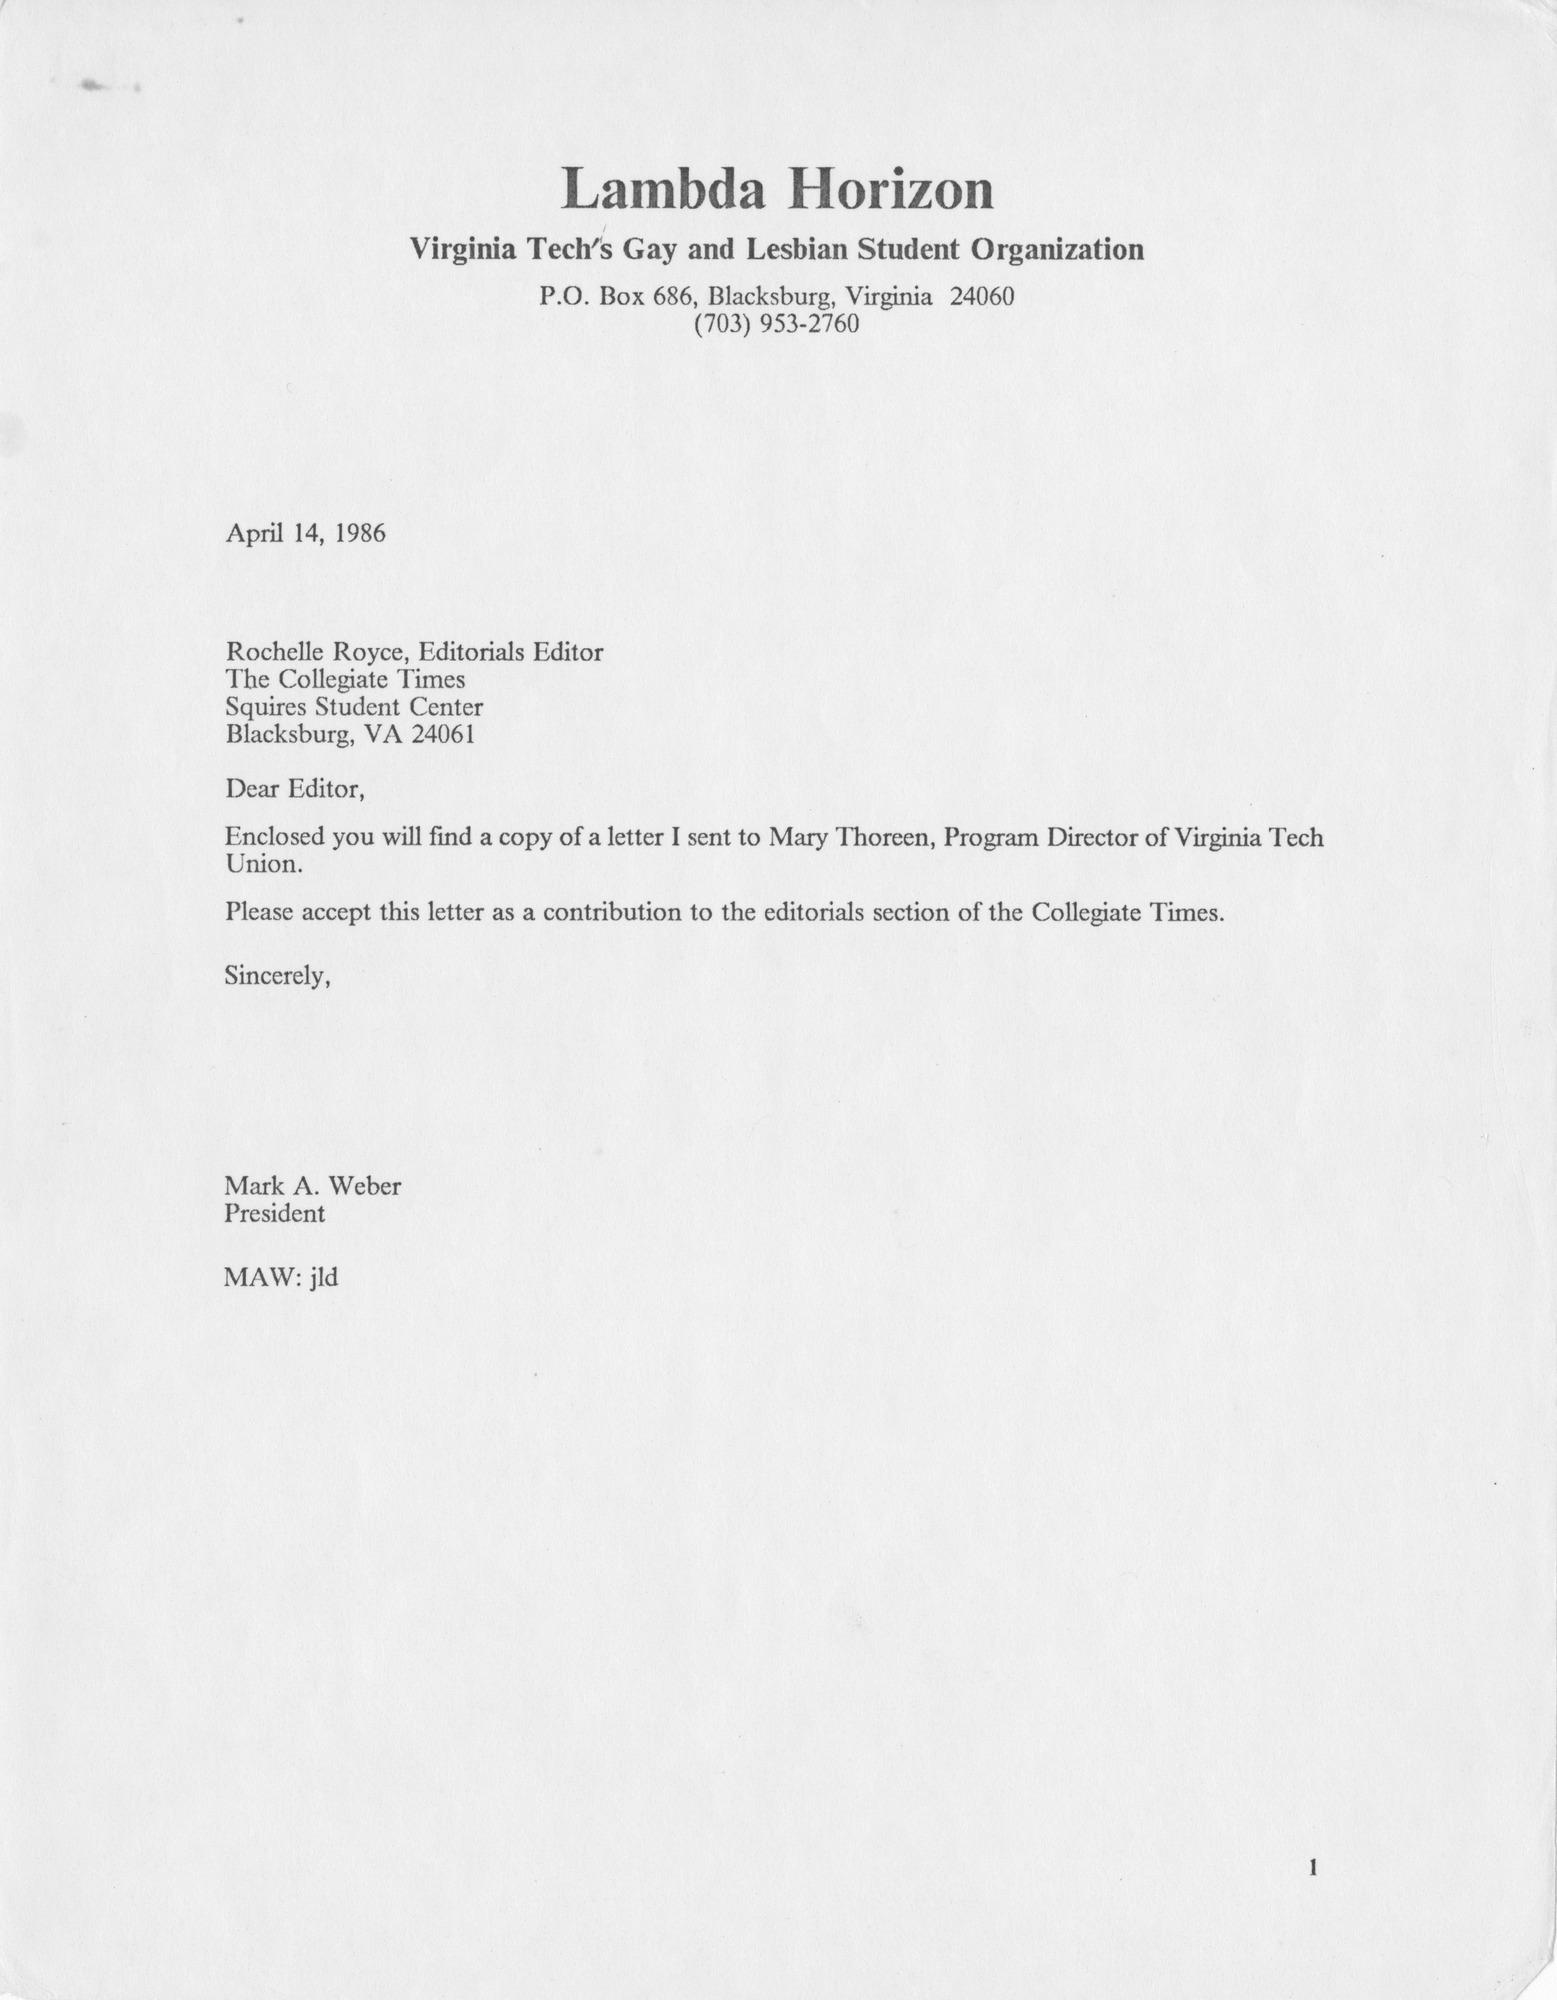 Ms2014-010_WeberMark_CorrespondenceEditorial_1986_0414.jpg